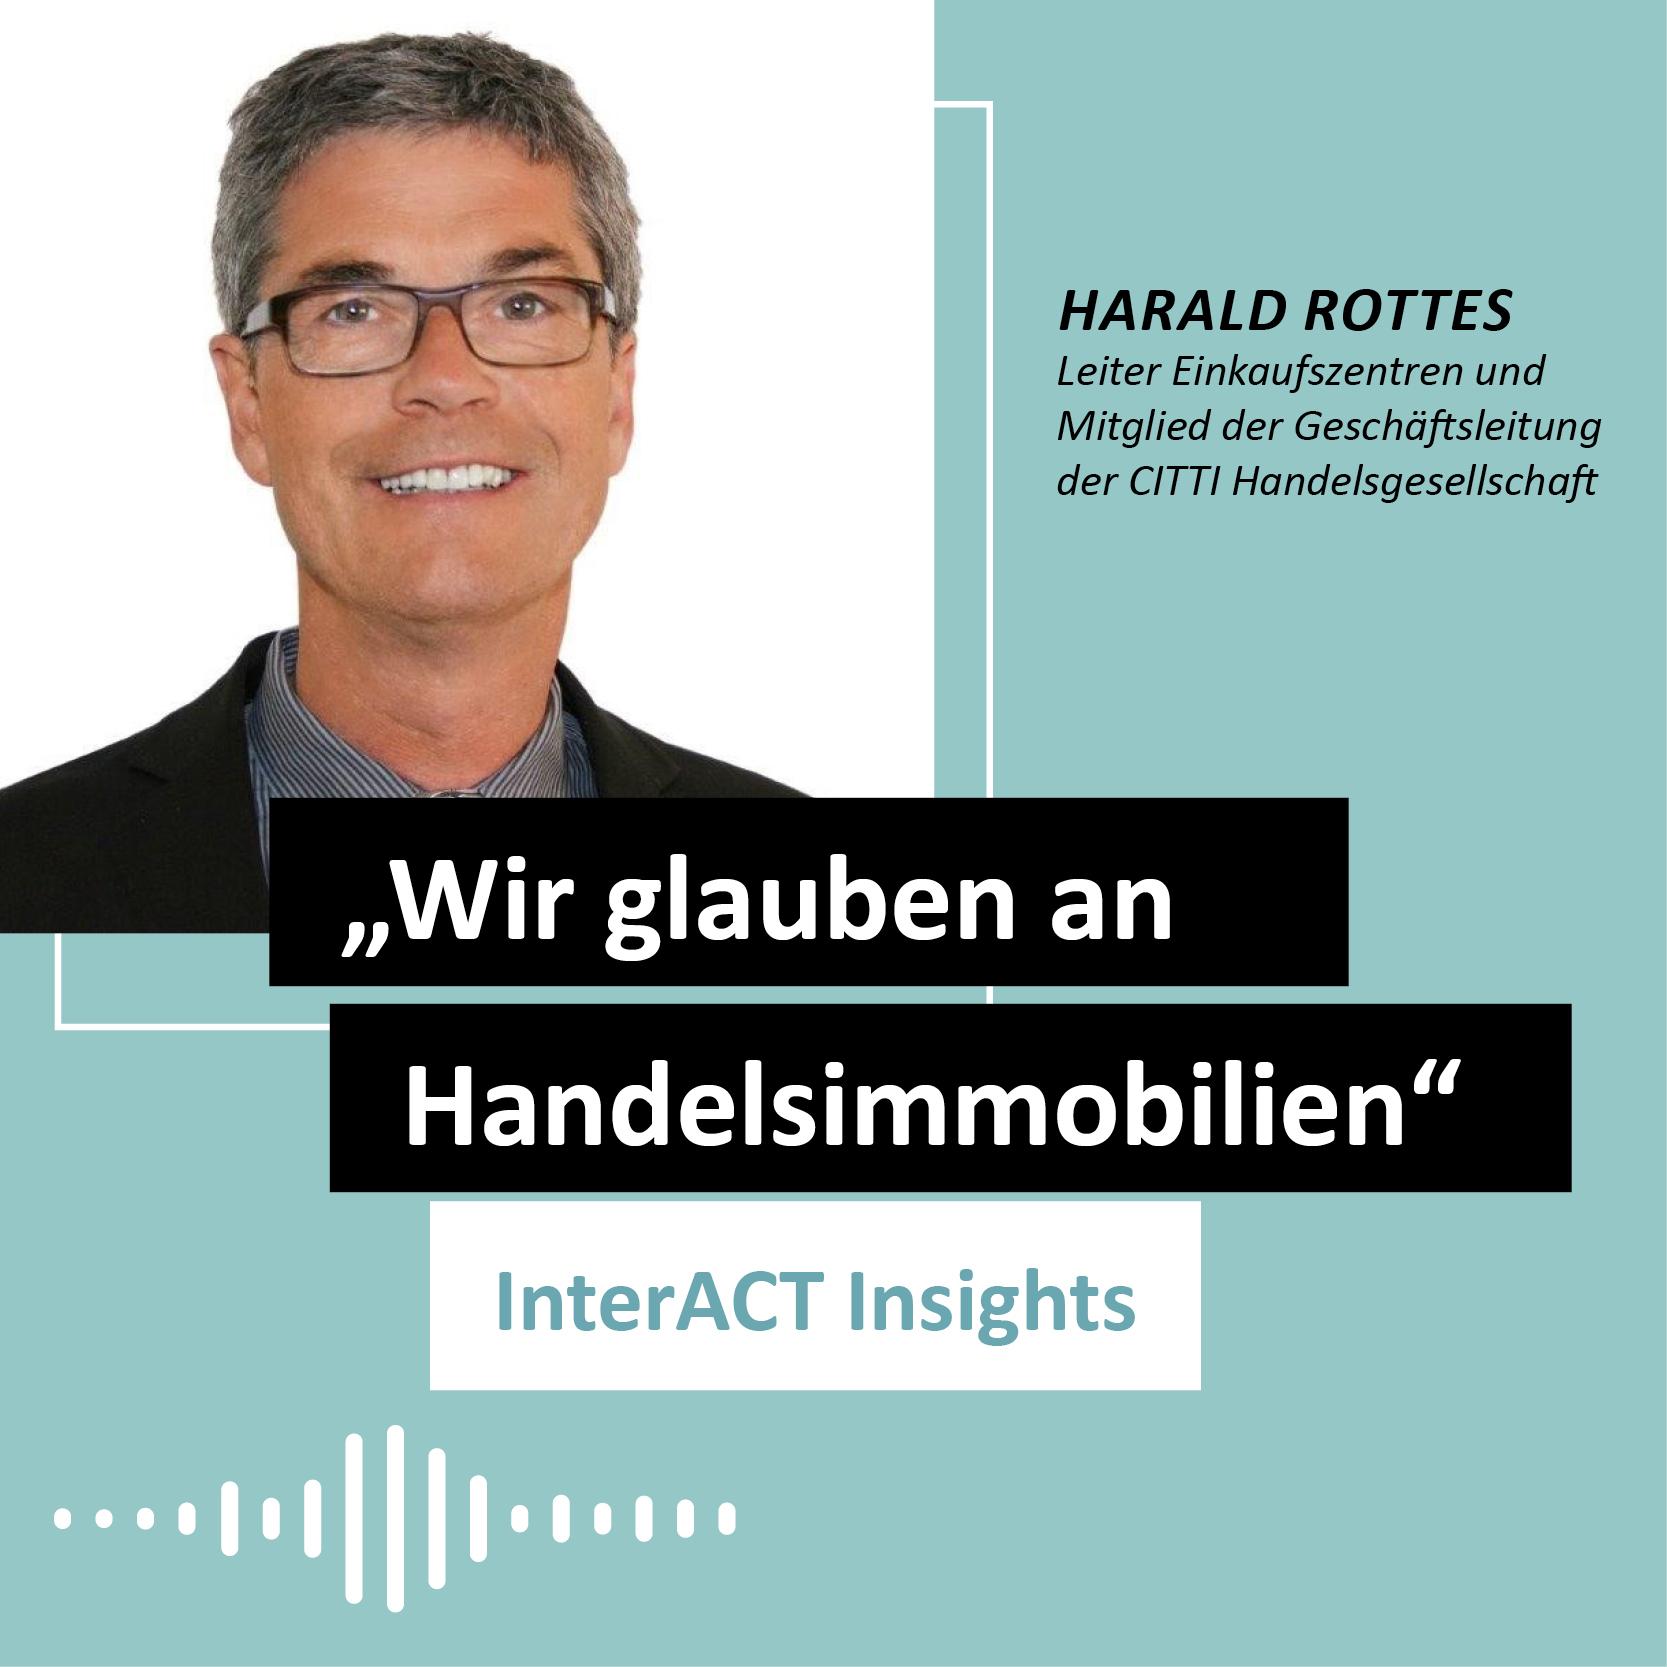 Harald Rottes